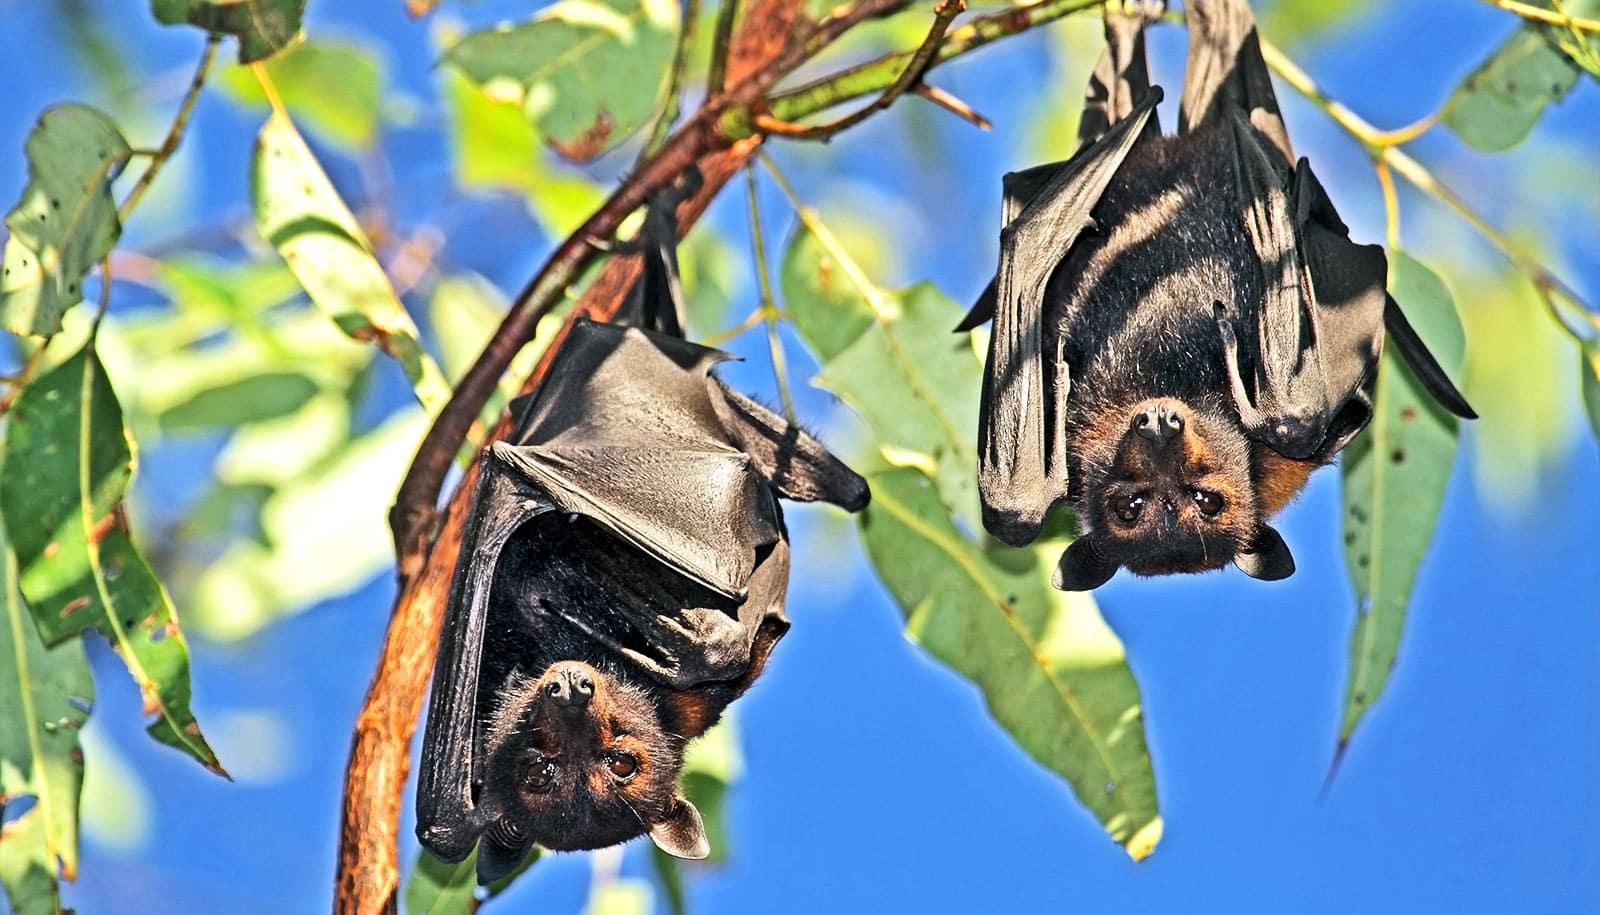 How bats harbor viruses but don't get sick